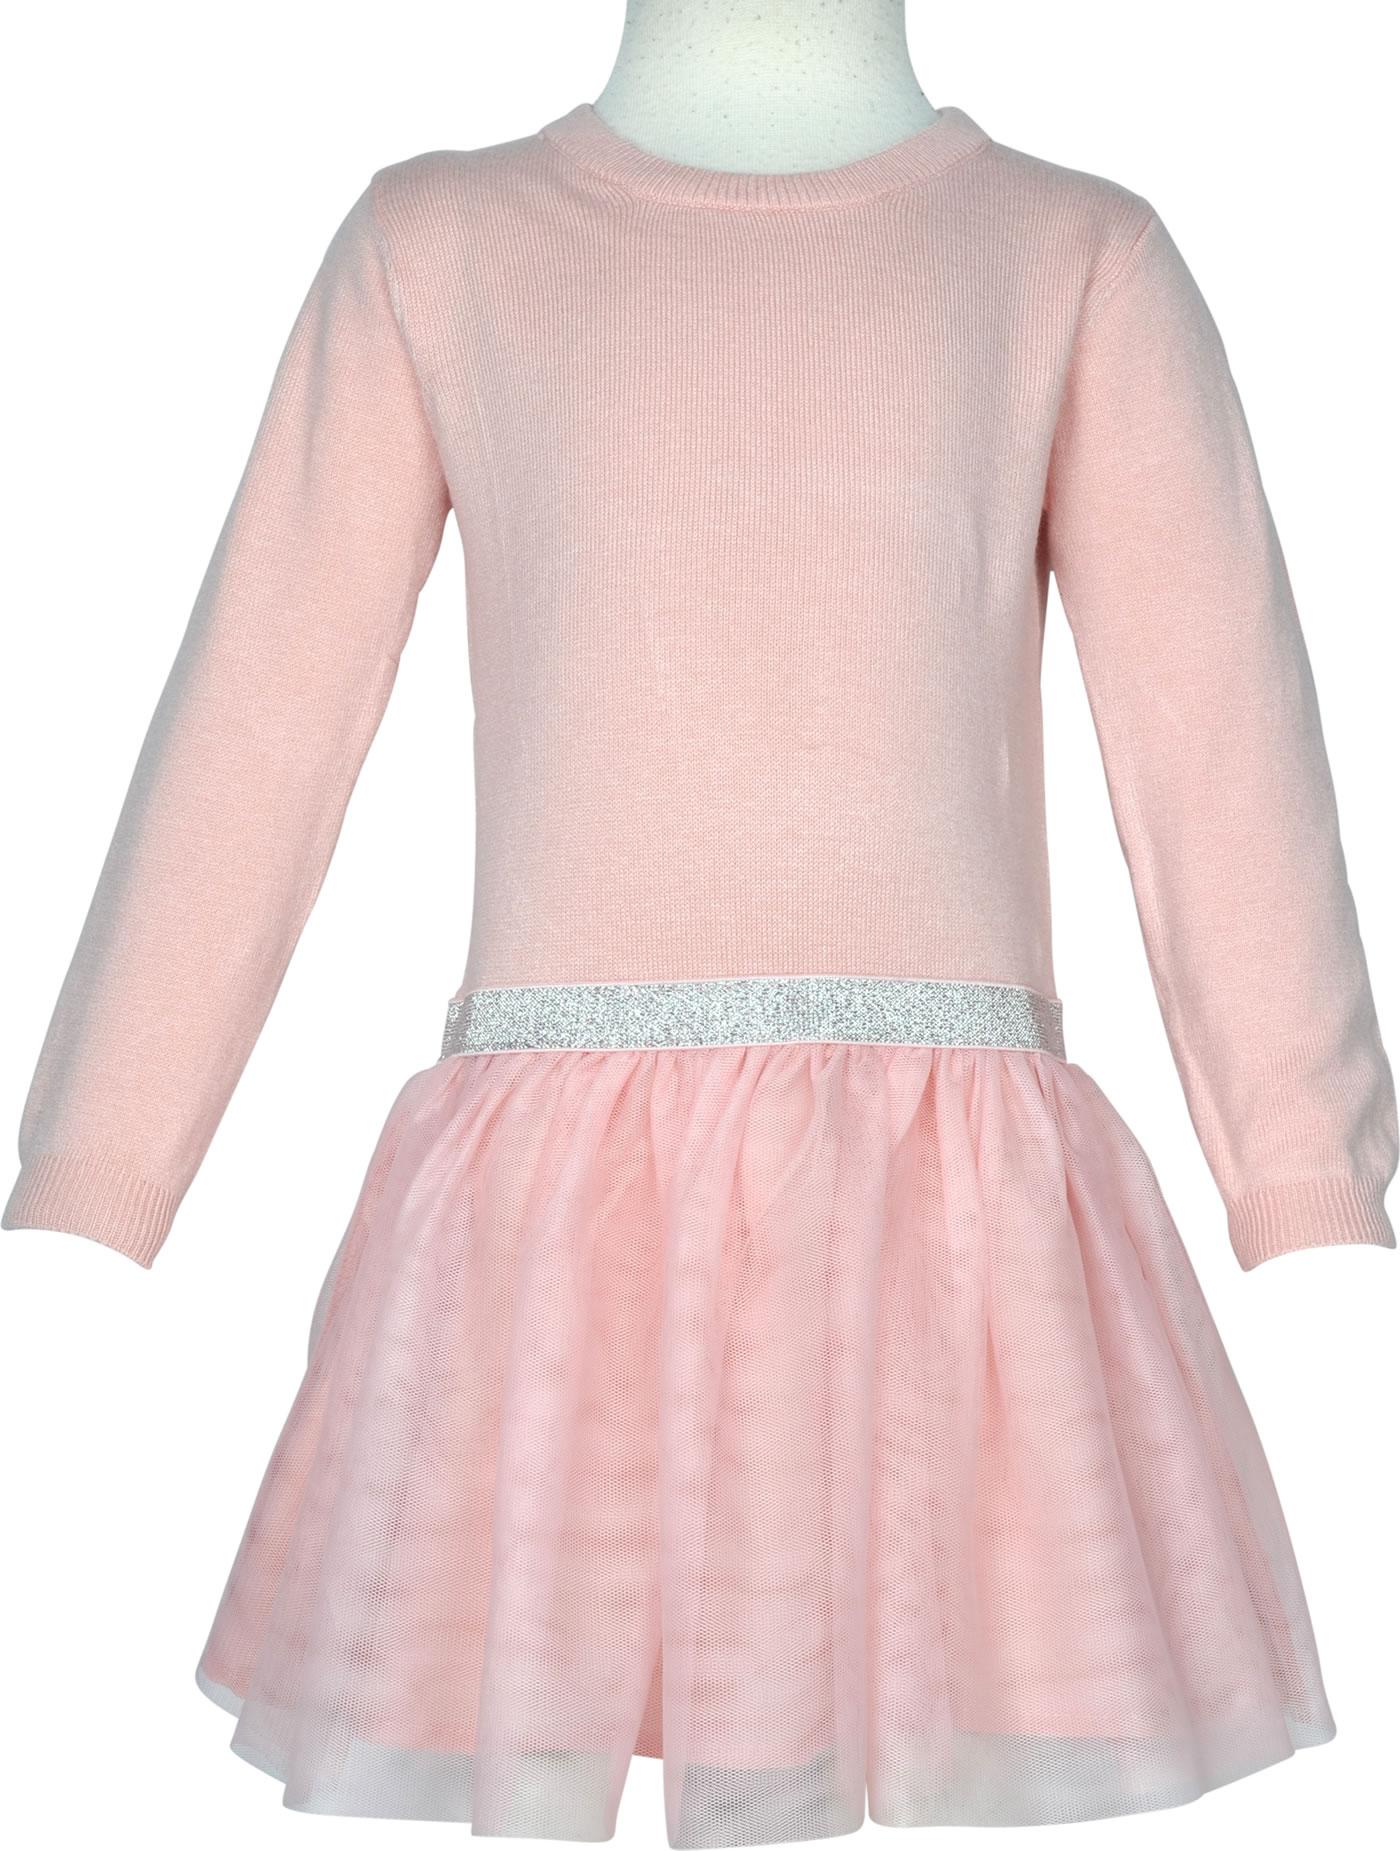 name it Festliches Kleid mit Tüllrock Langarm NMFRALIKKA silver pink  18